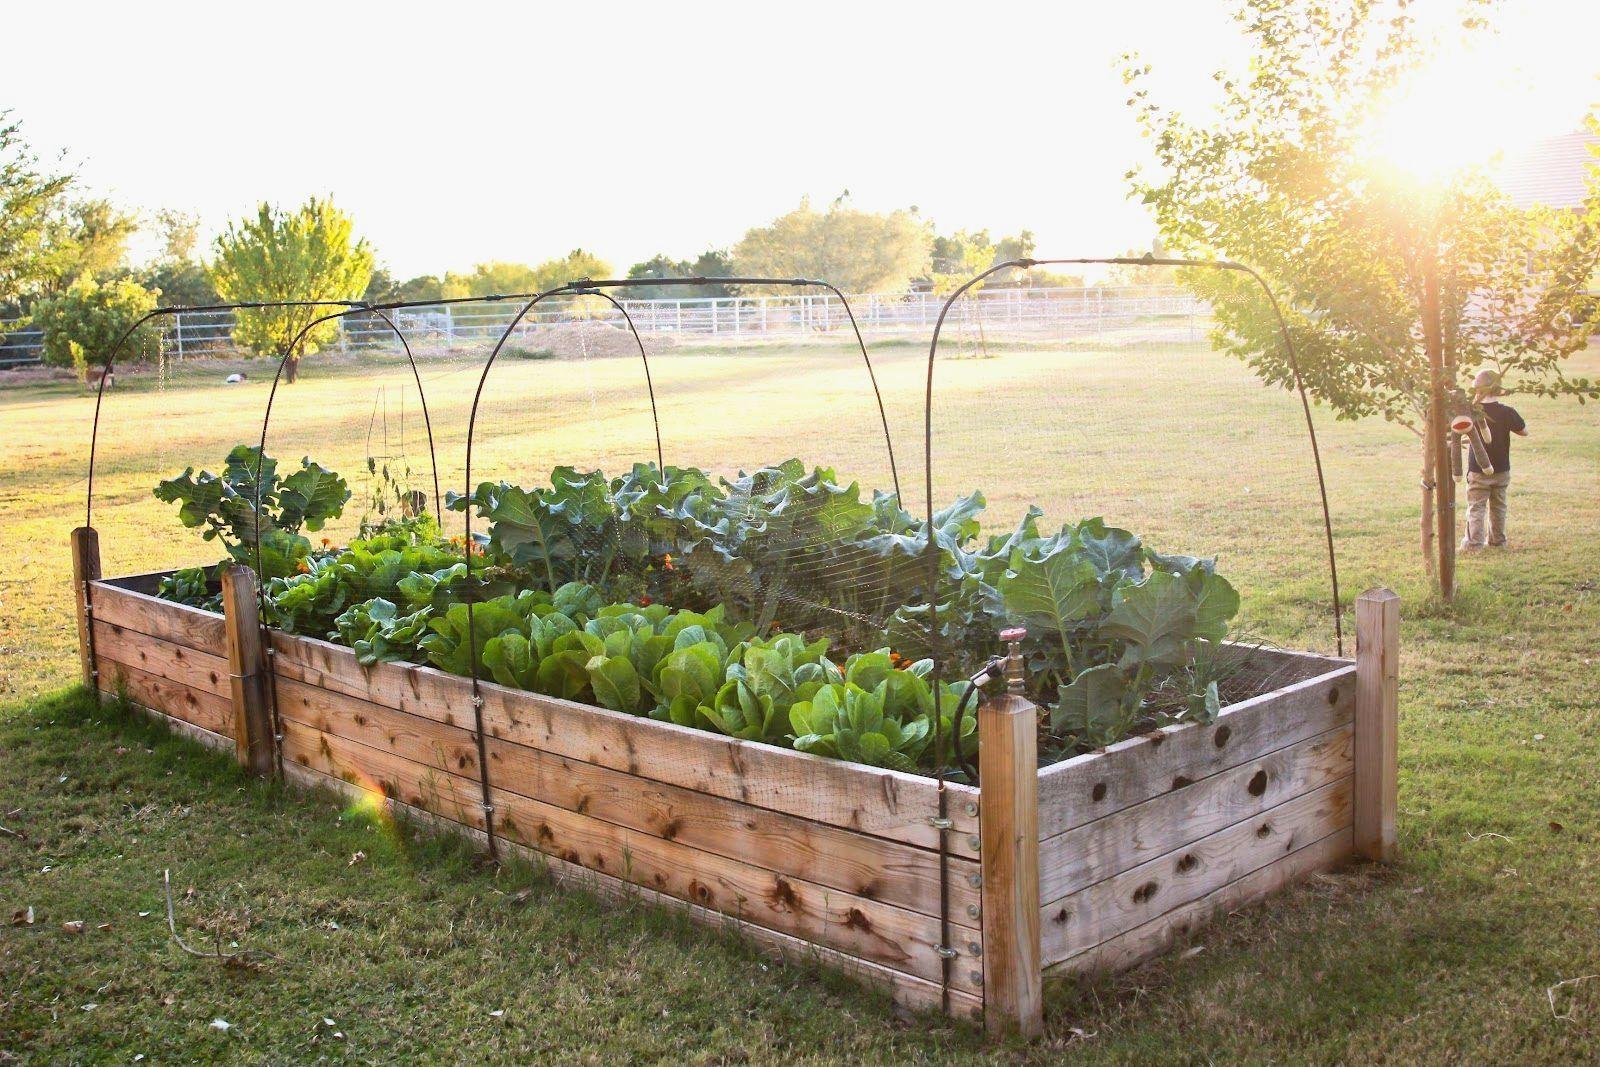 Diy raised gardens for your home diy raised gardens pinterest